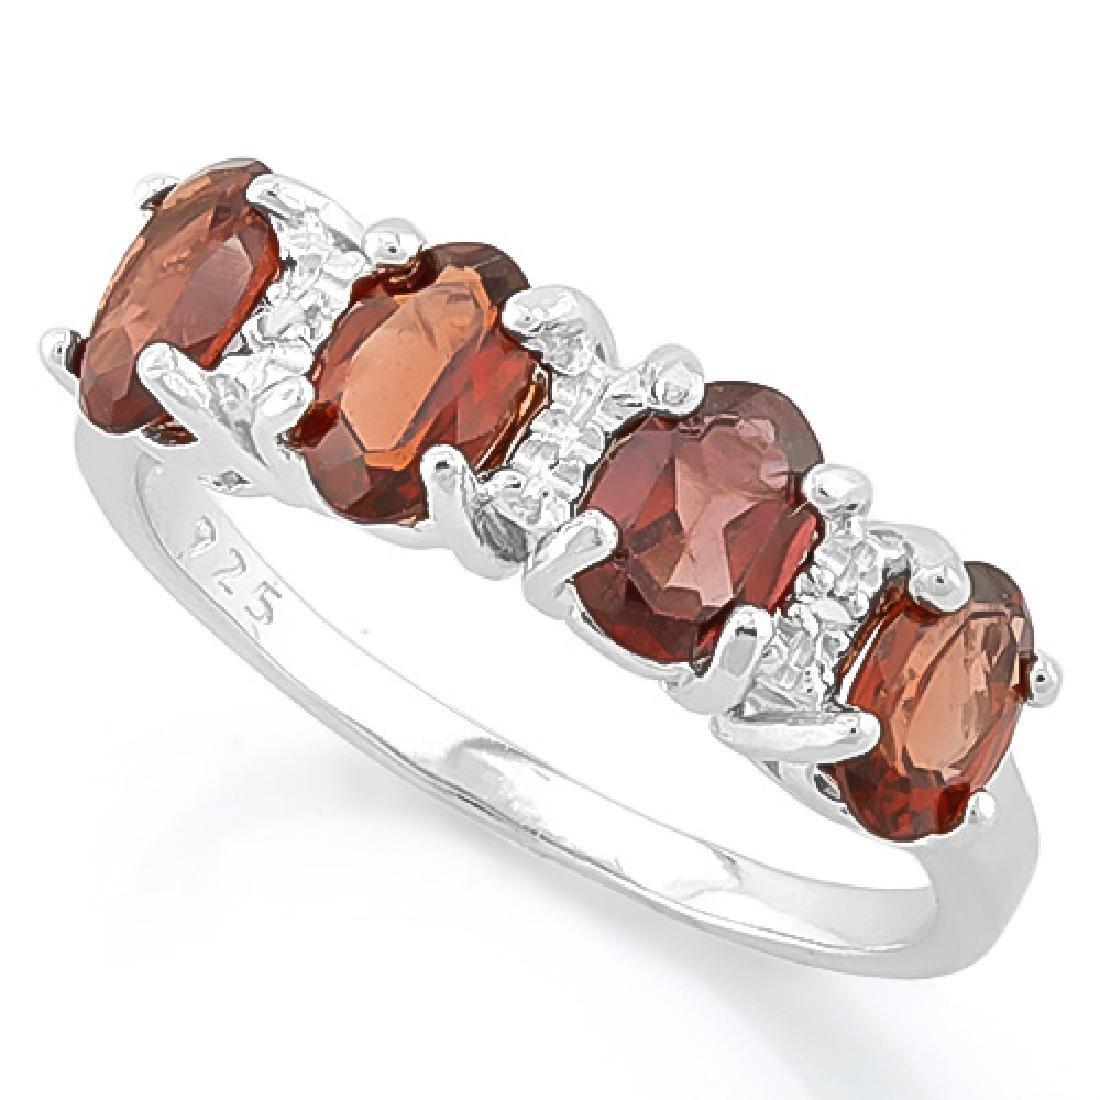 AMAZING 8CT GARNET/DIAMOND ROW STERLING RING